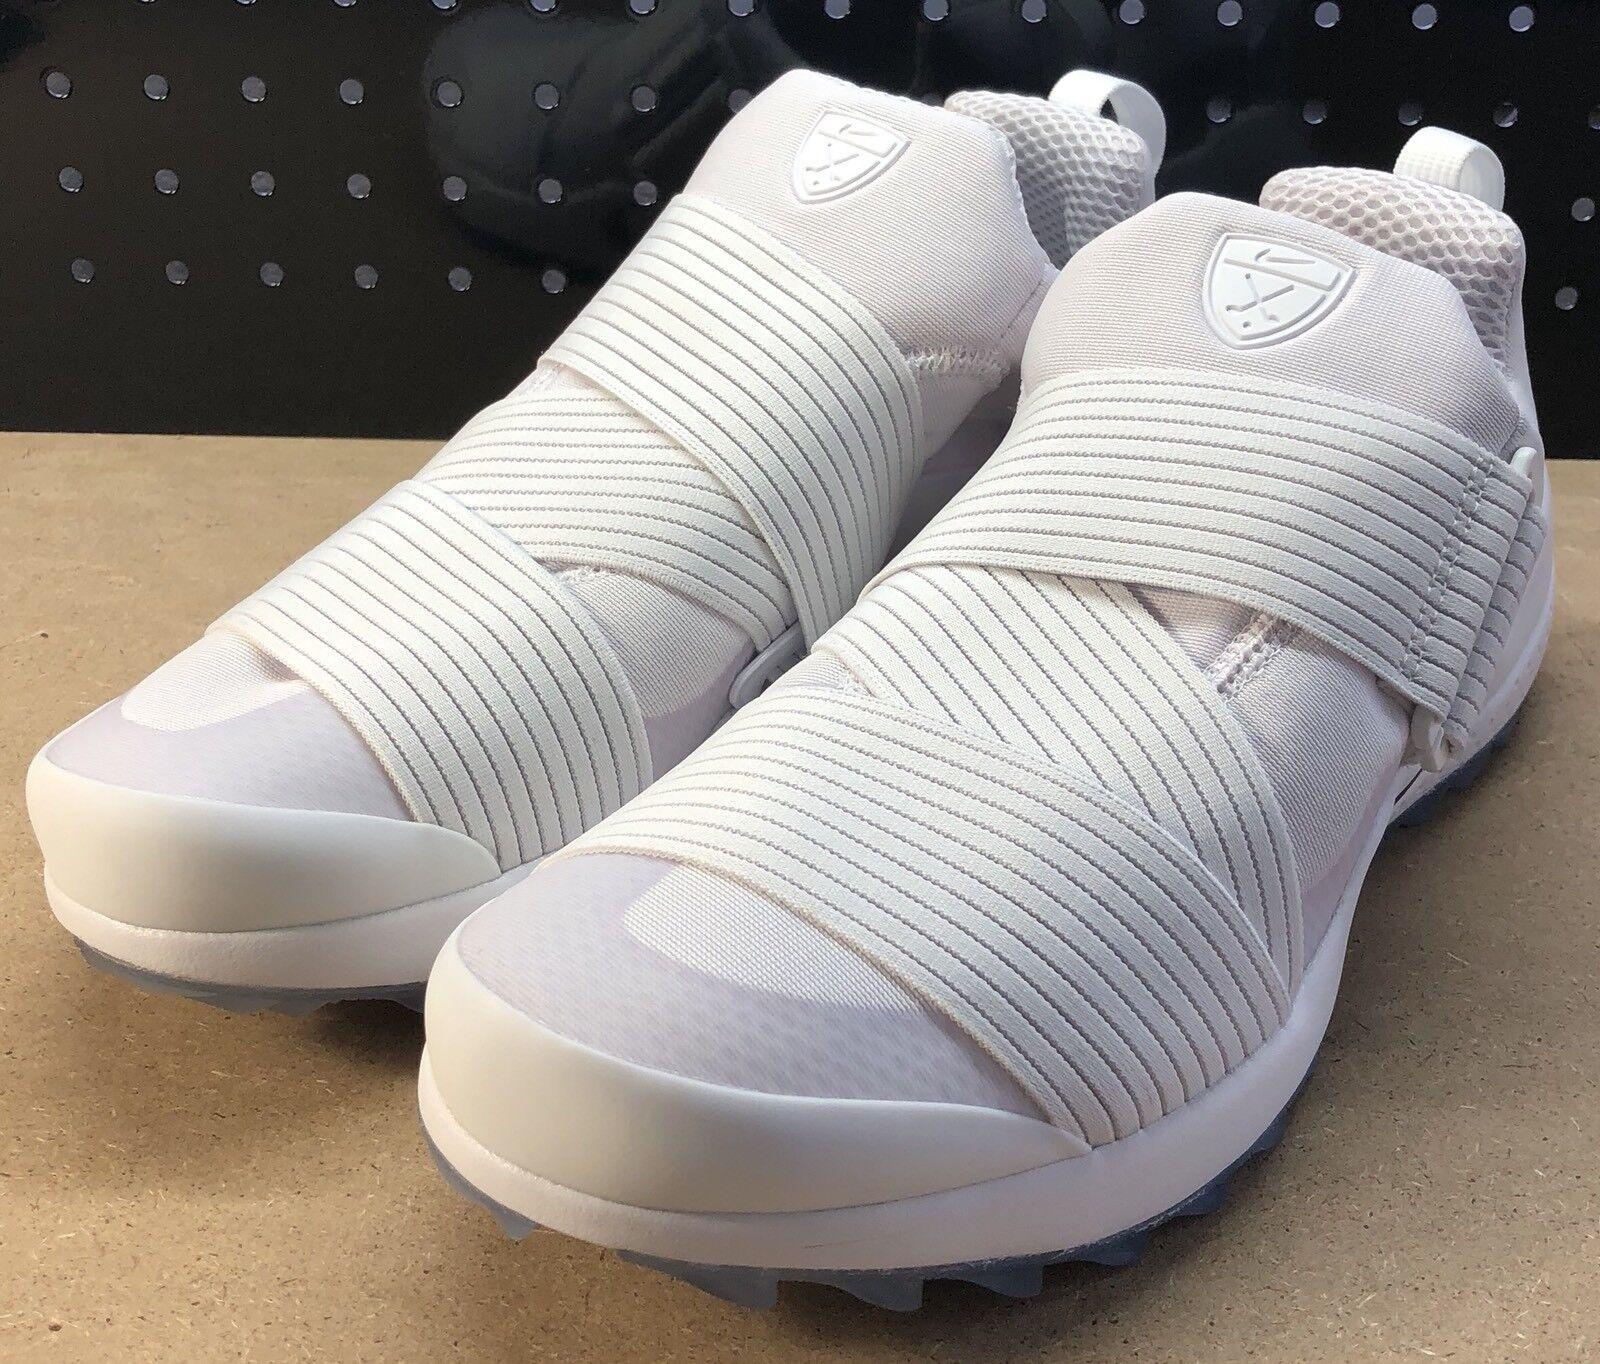 Nike air zoom - senza tacchetti bianco nero taglia 849955-100 scarpe da golf